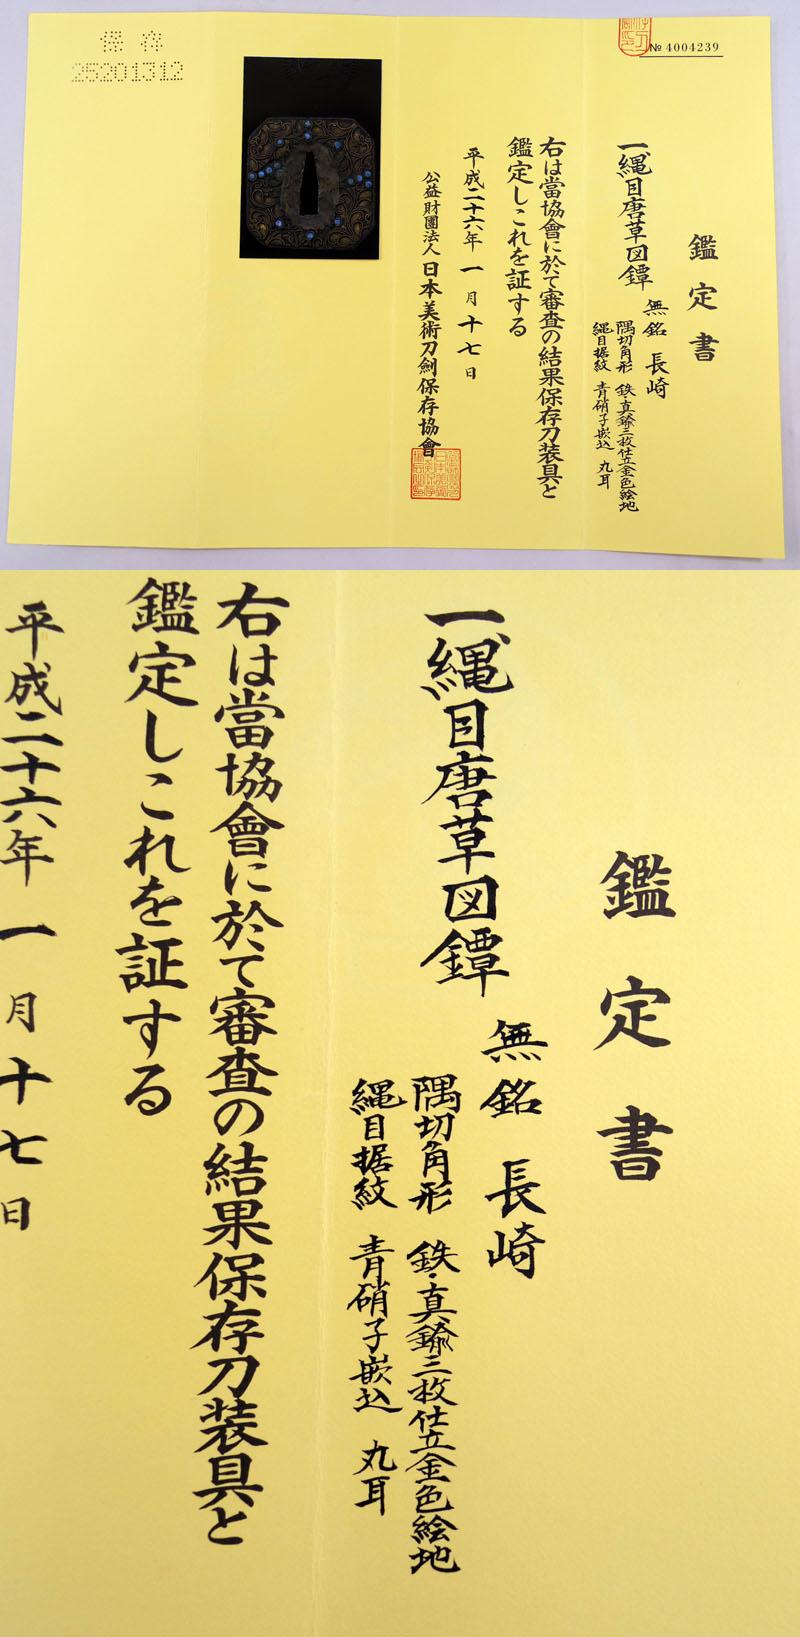 縄目唐草図鍔 無銘 Nagasaki Picture of Certificate